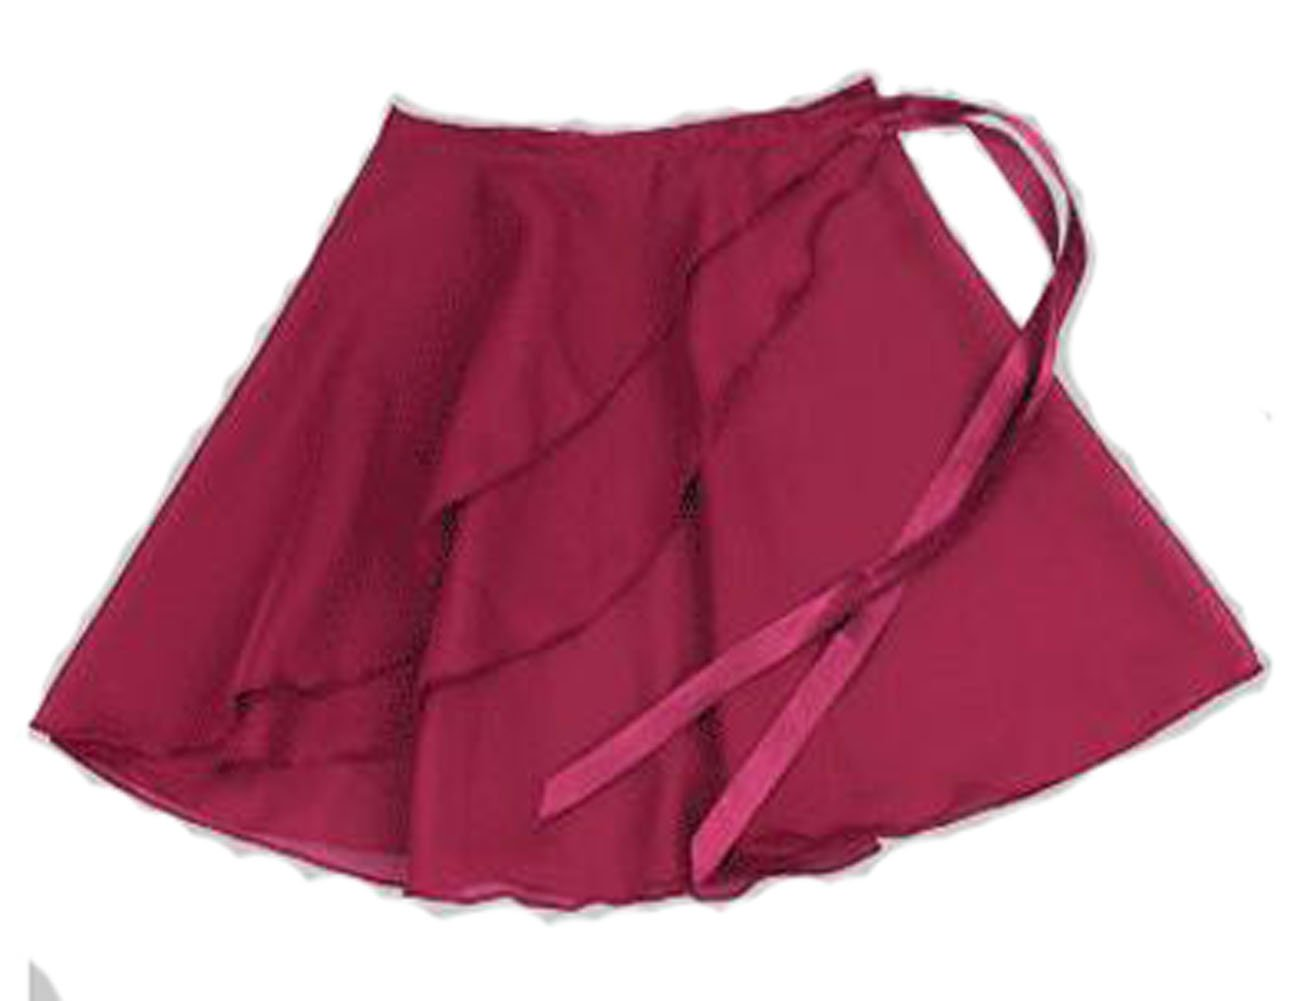 JXUFUFOO Big Girls Asymmetric Ballet Dance Wrap Skirt Chiffon Black TUTU08